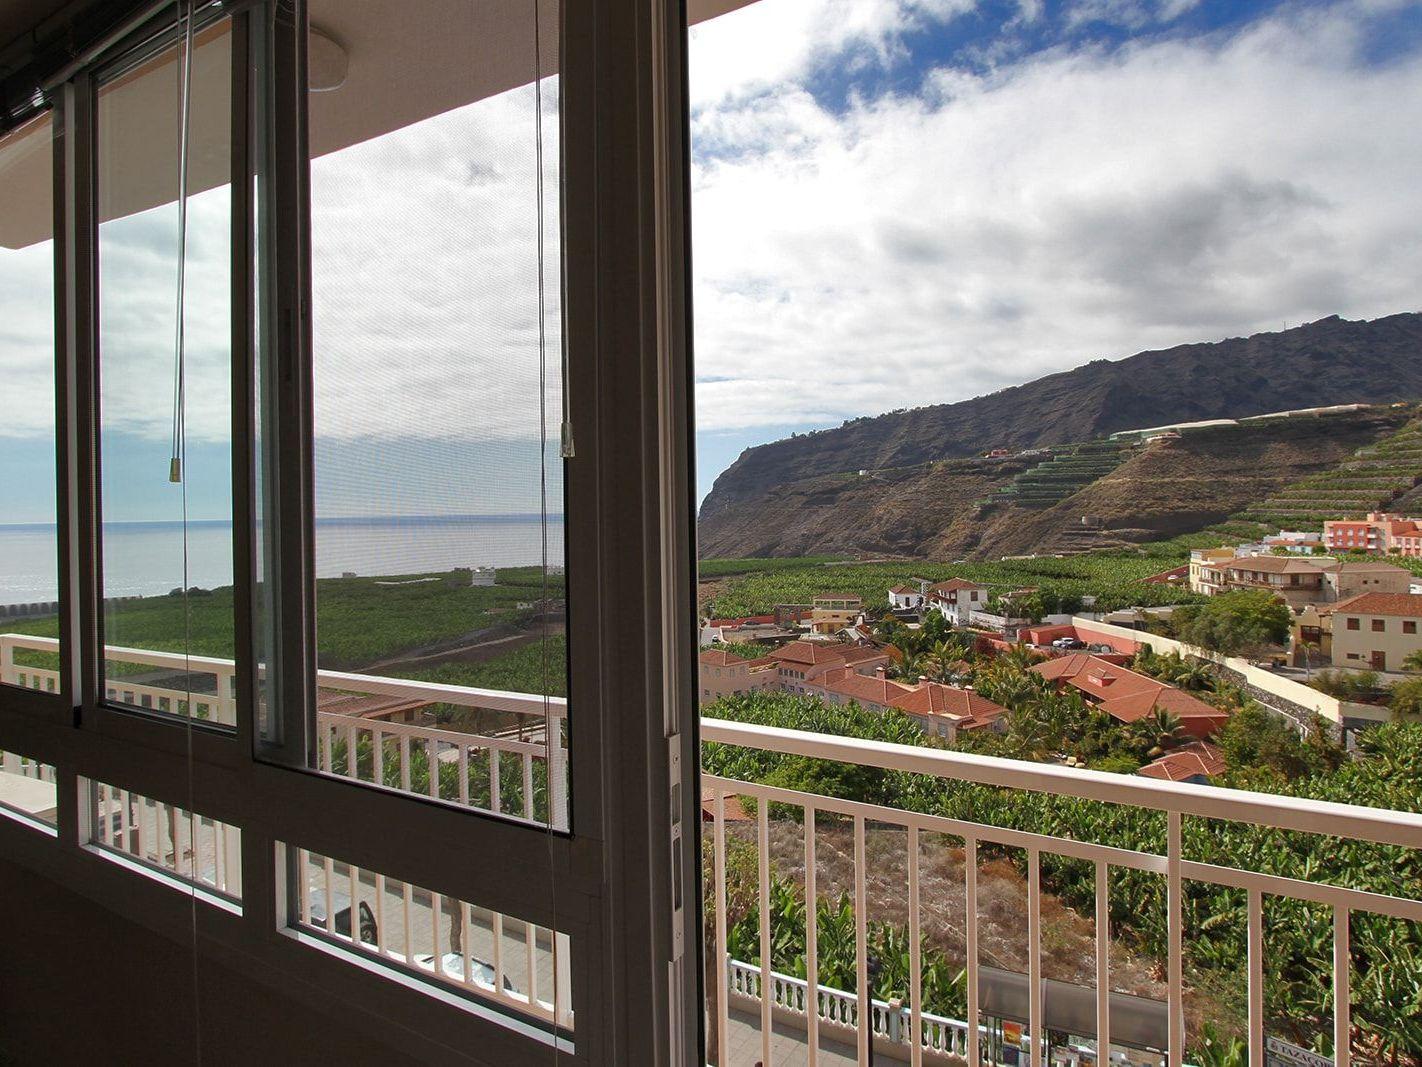 Coaching-Reise mit Meerblick - La Palma